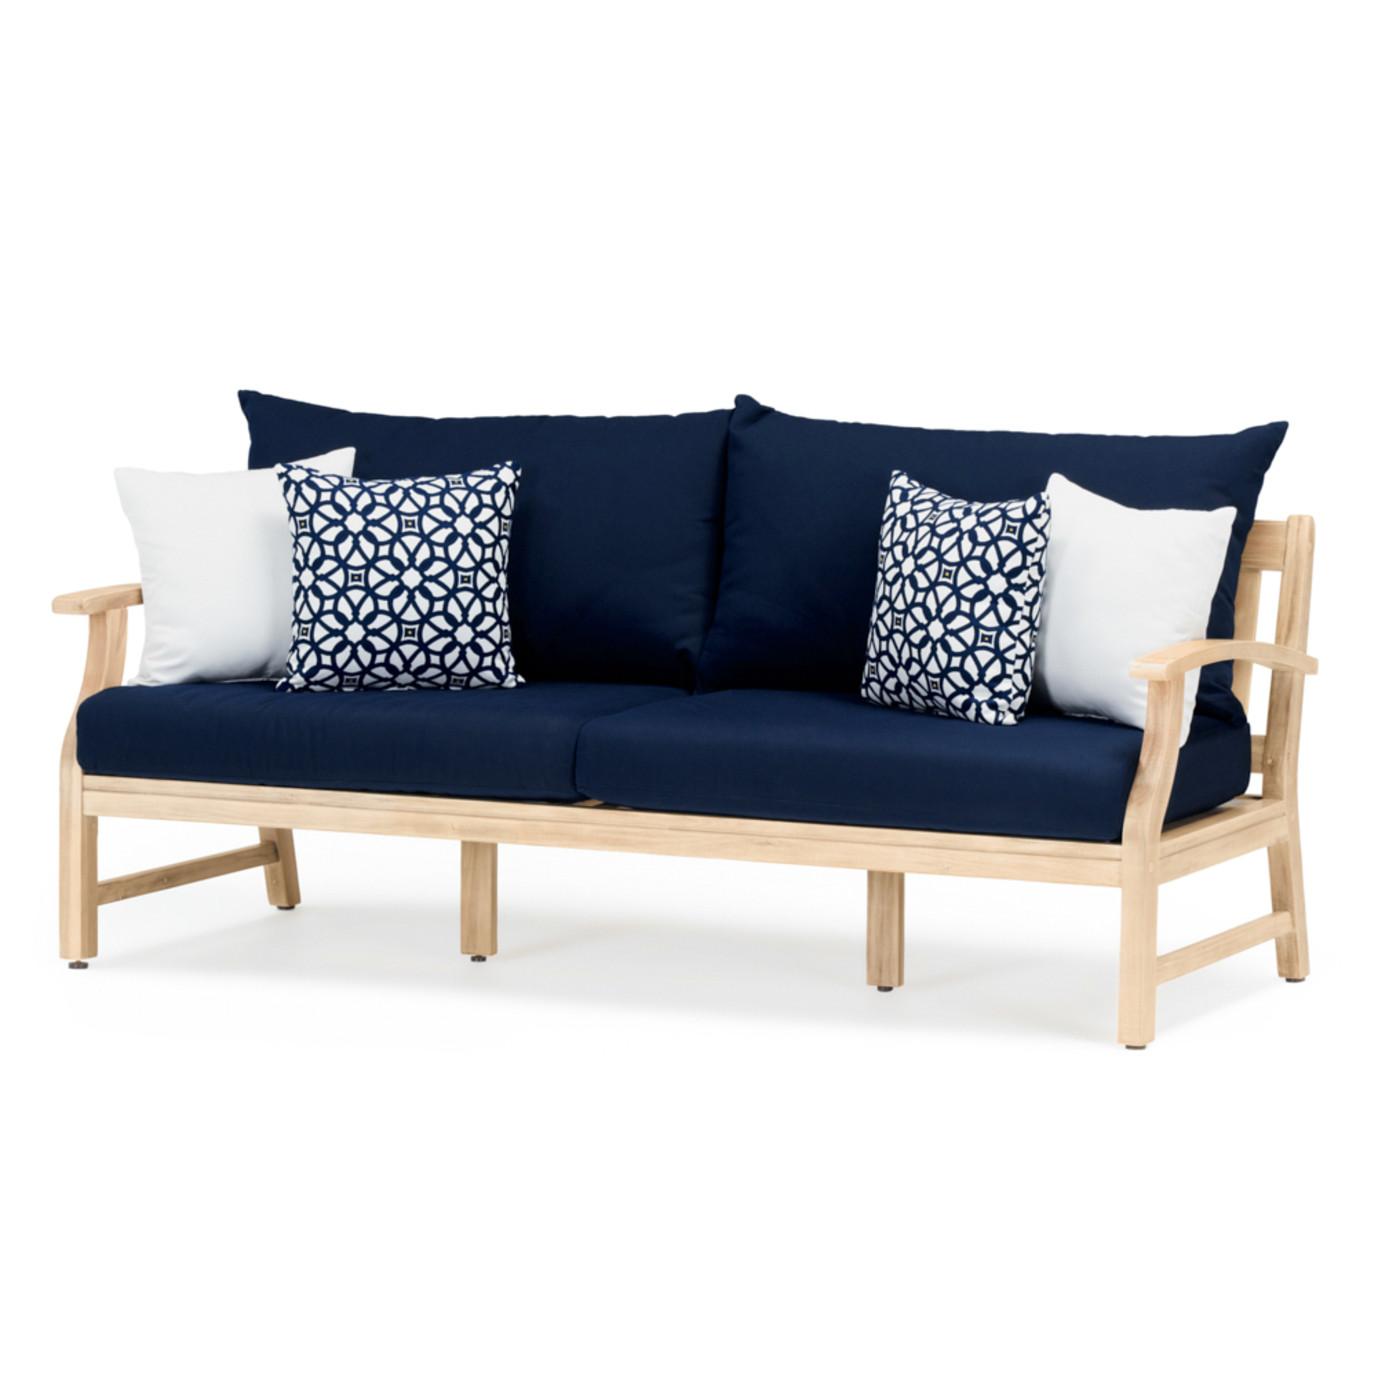 Kooper™ 76in Sofa - Navy Blue